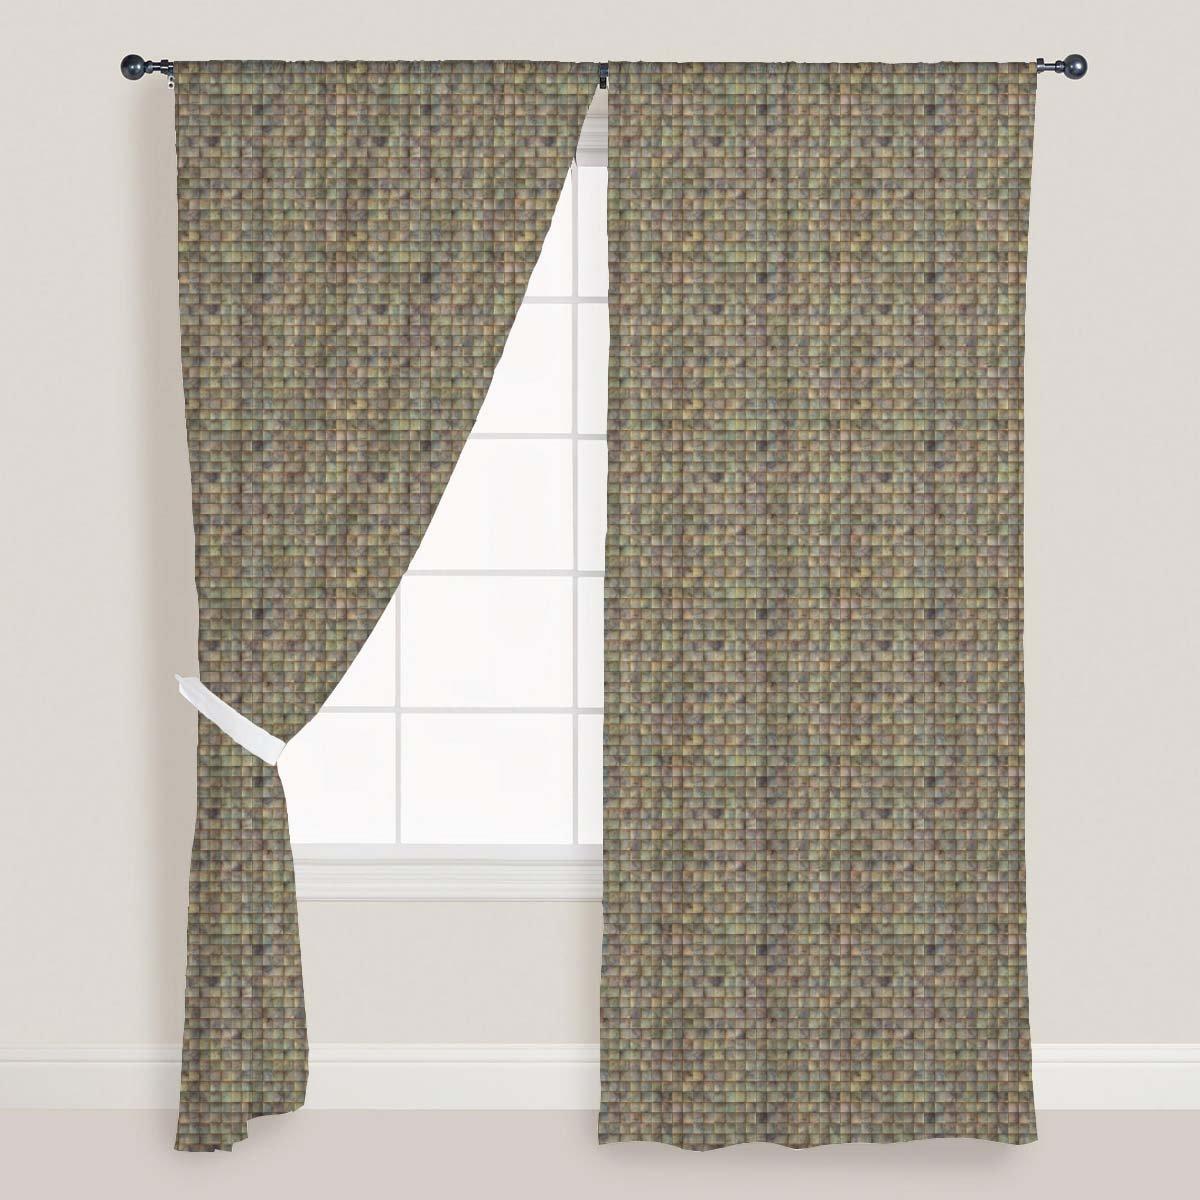 AZ Tiled Art Door & Window Curtain Satin 4feet x 10feet; SET OF 2 PCS